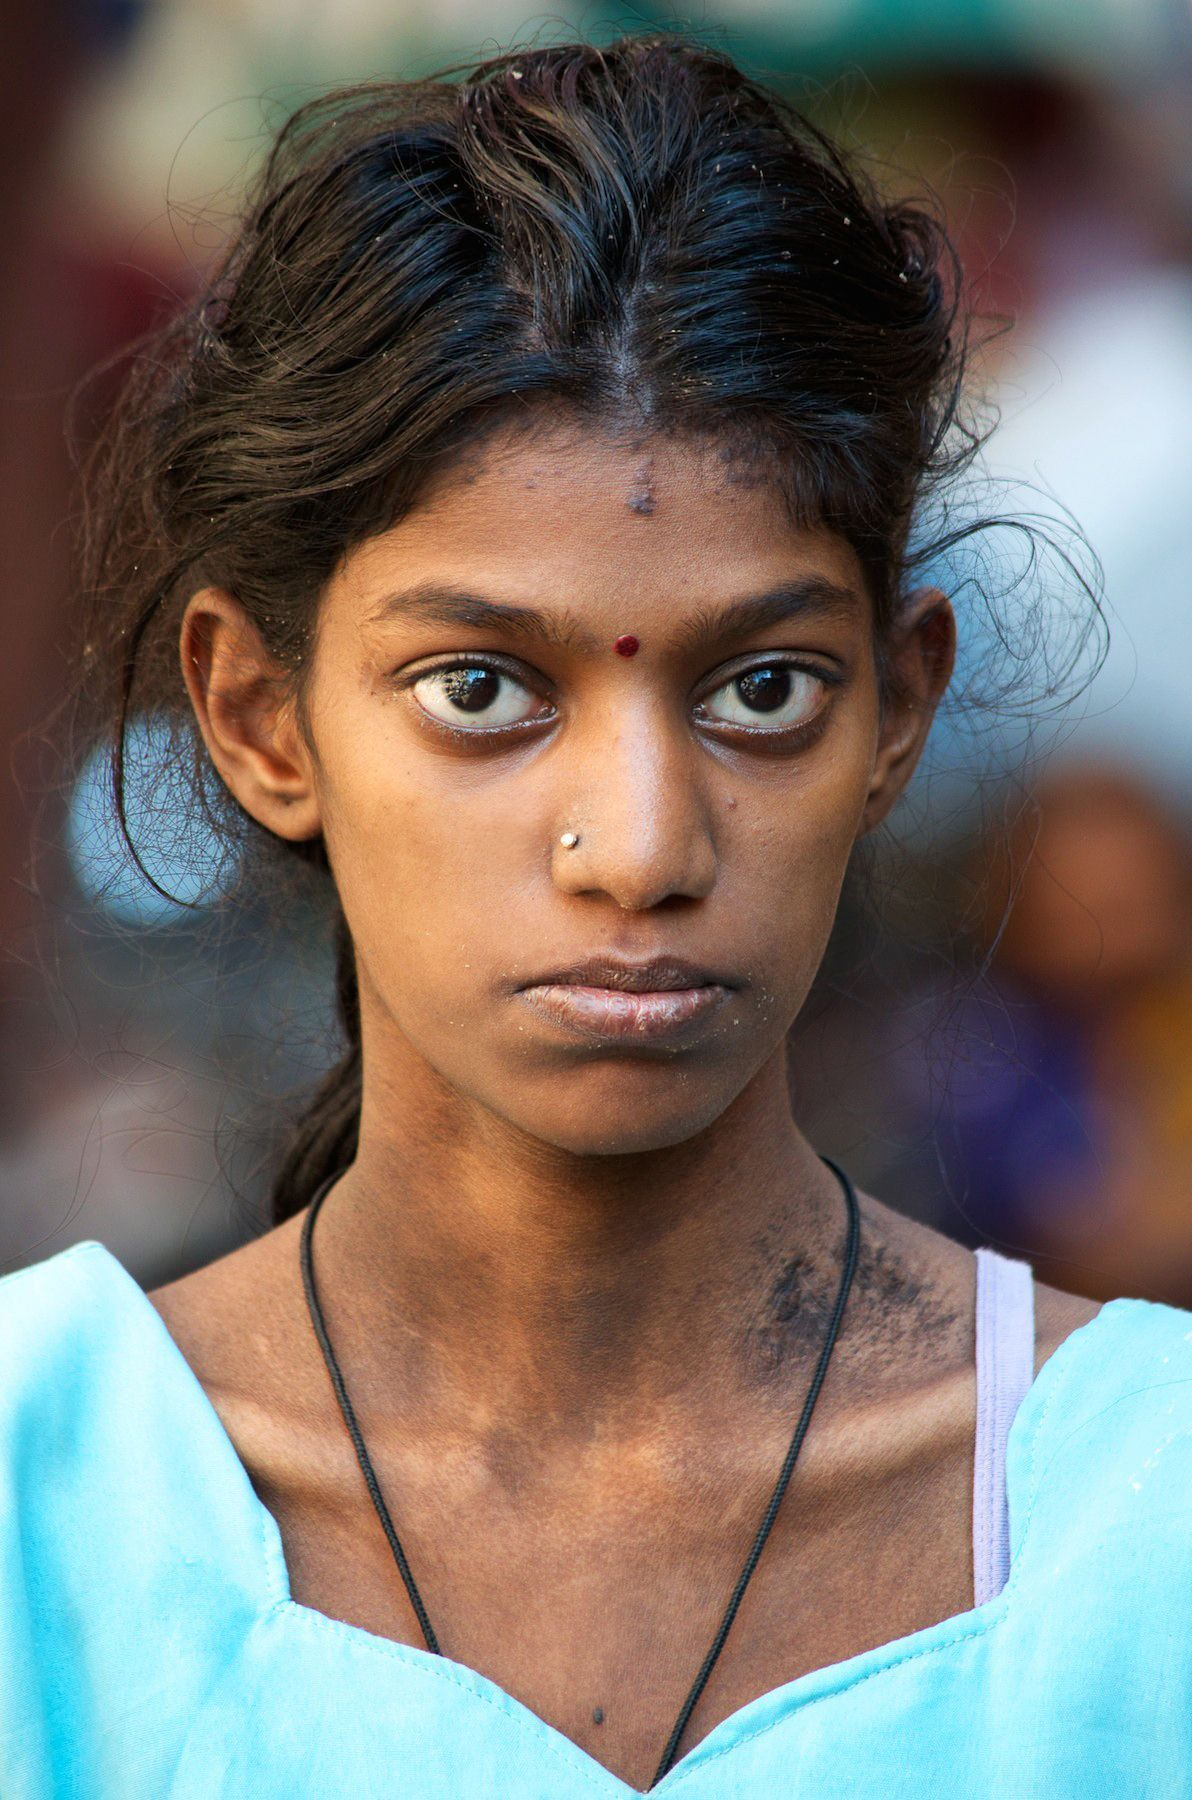 Slum girl photo